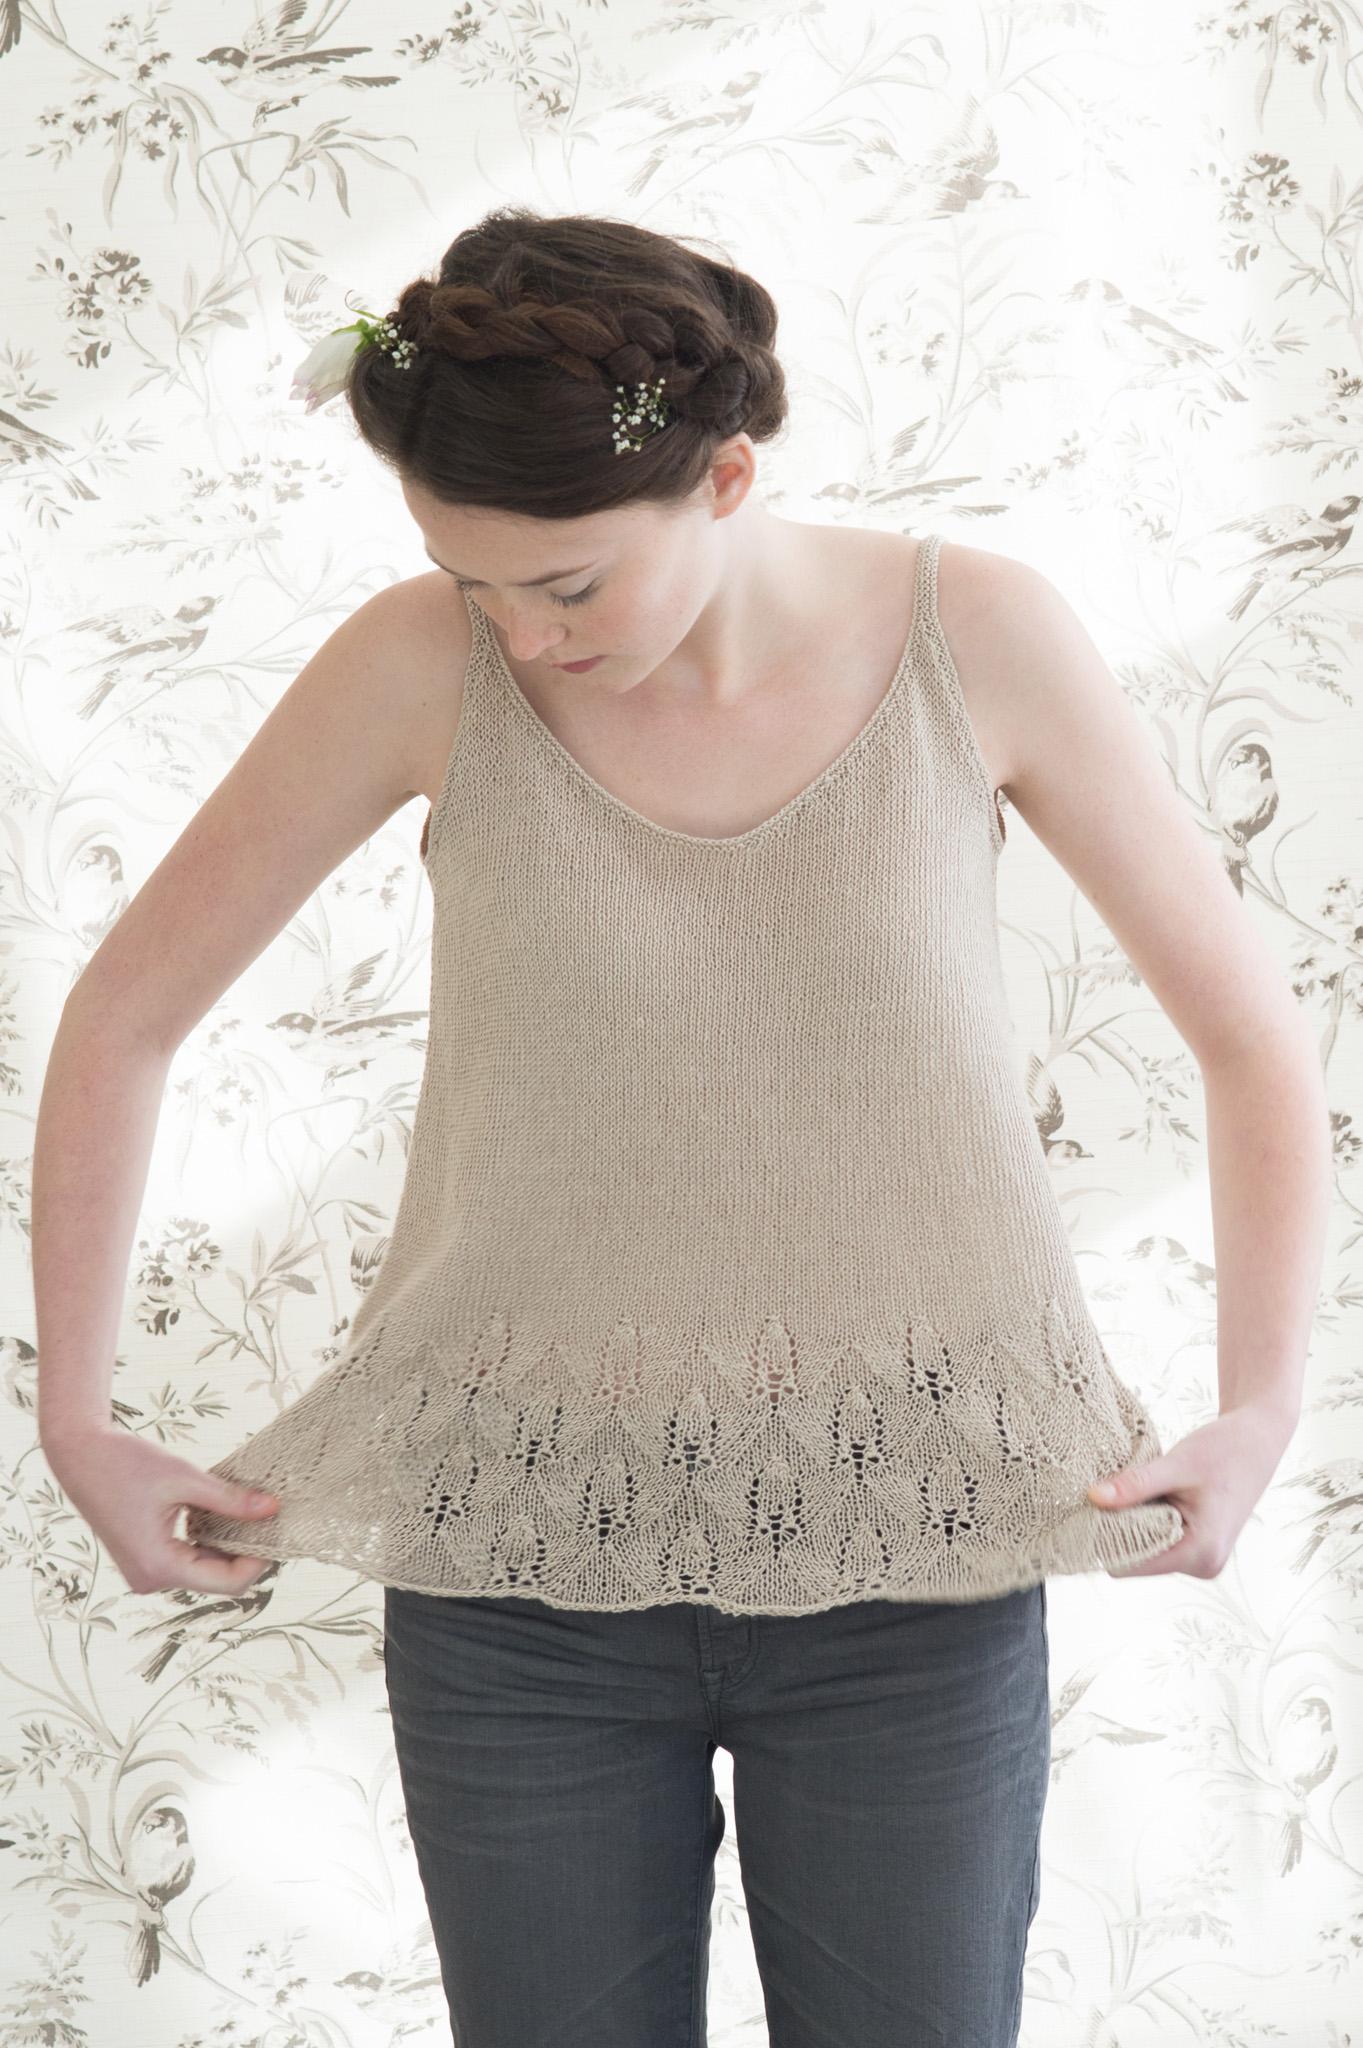 -quince-co-azalea-pam-allen-knitting-pattern-sparrow-2.jpg